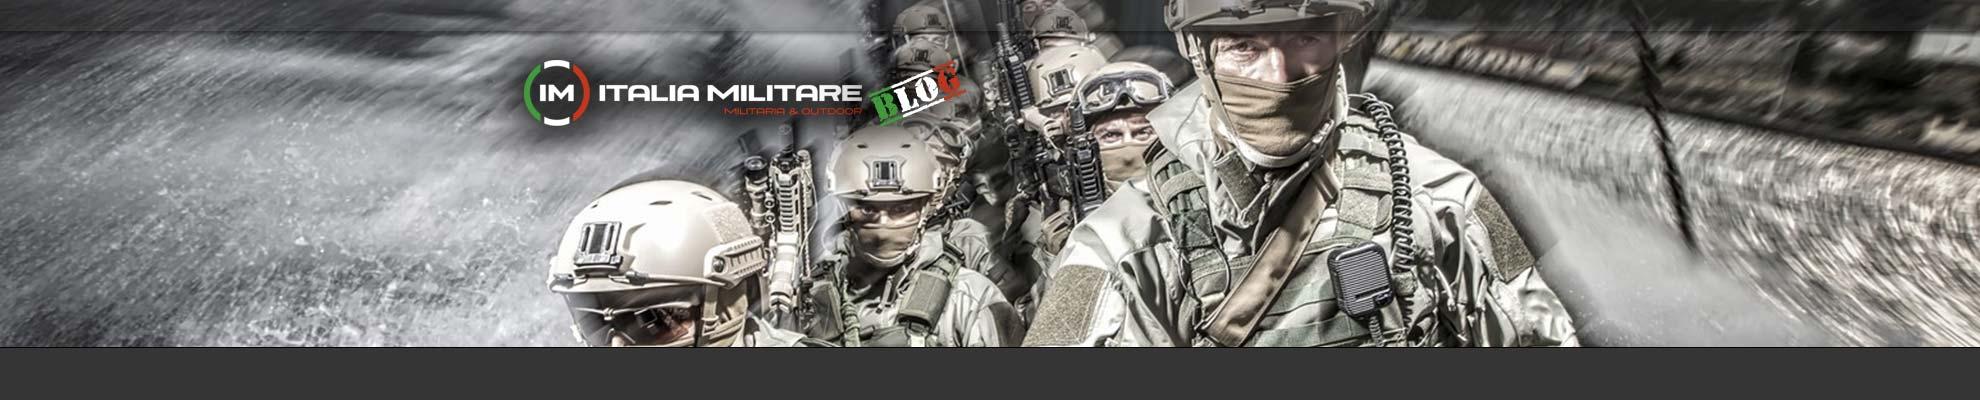 marina-militare-goi-banner-4